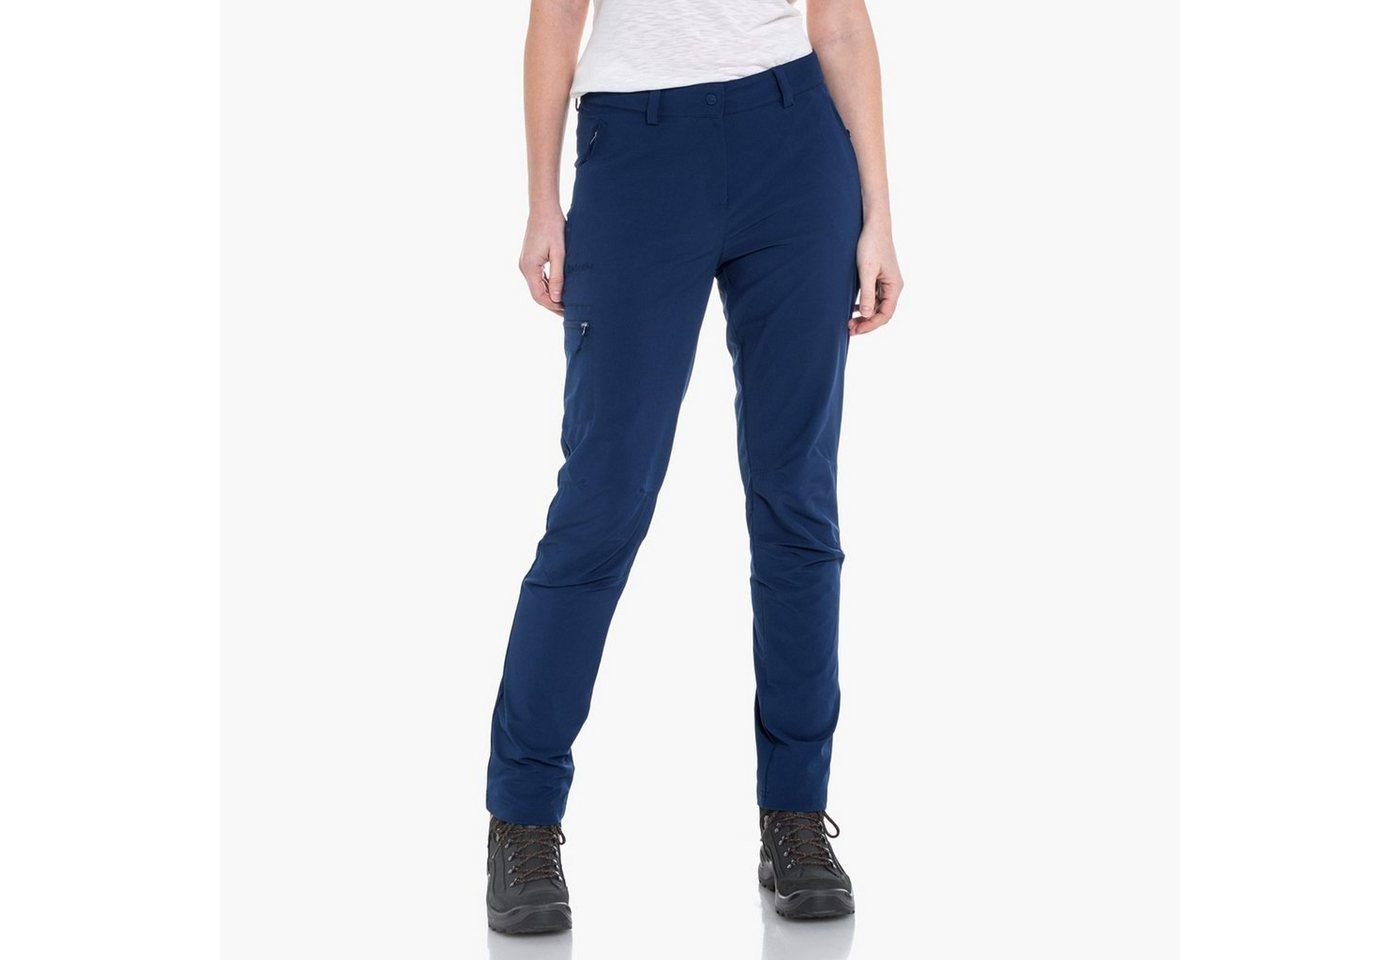 Schöffel Outdoorhose »Pants Ascona«   Bekleidung > Hosen > Outdoorhosen   Blau   Nylon   Schöffel